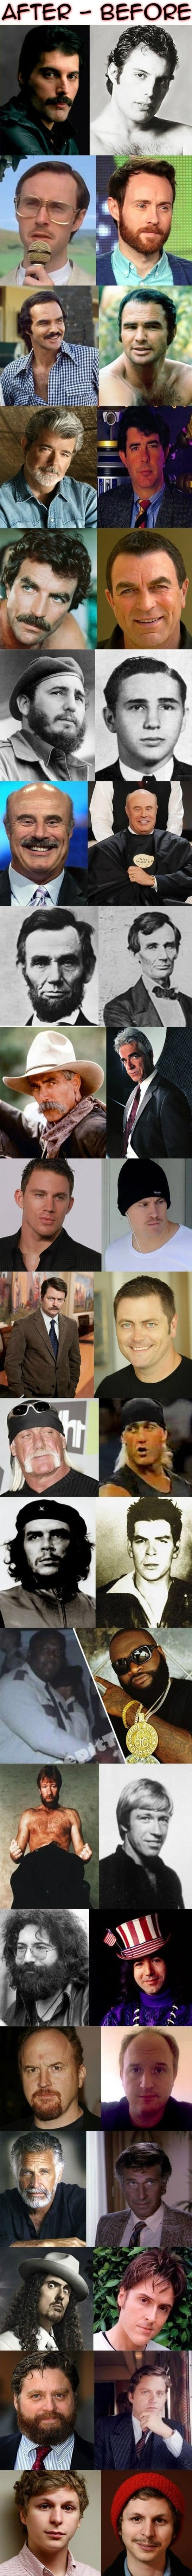 Funny Celebirty Beards - After vs. Before meme jokes